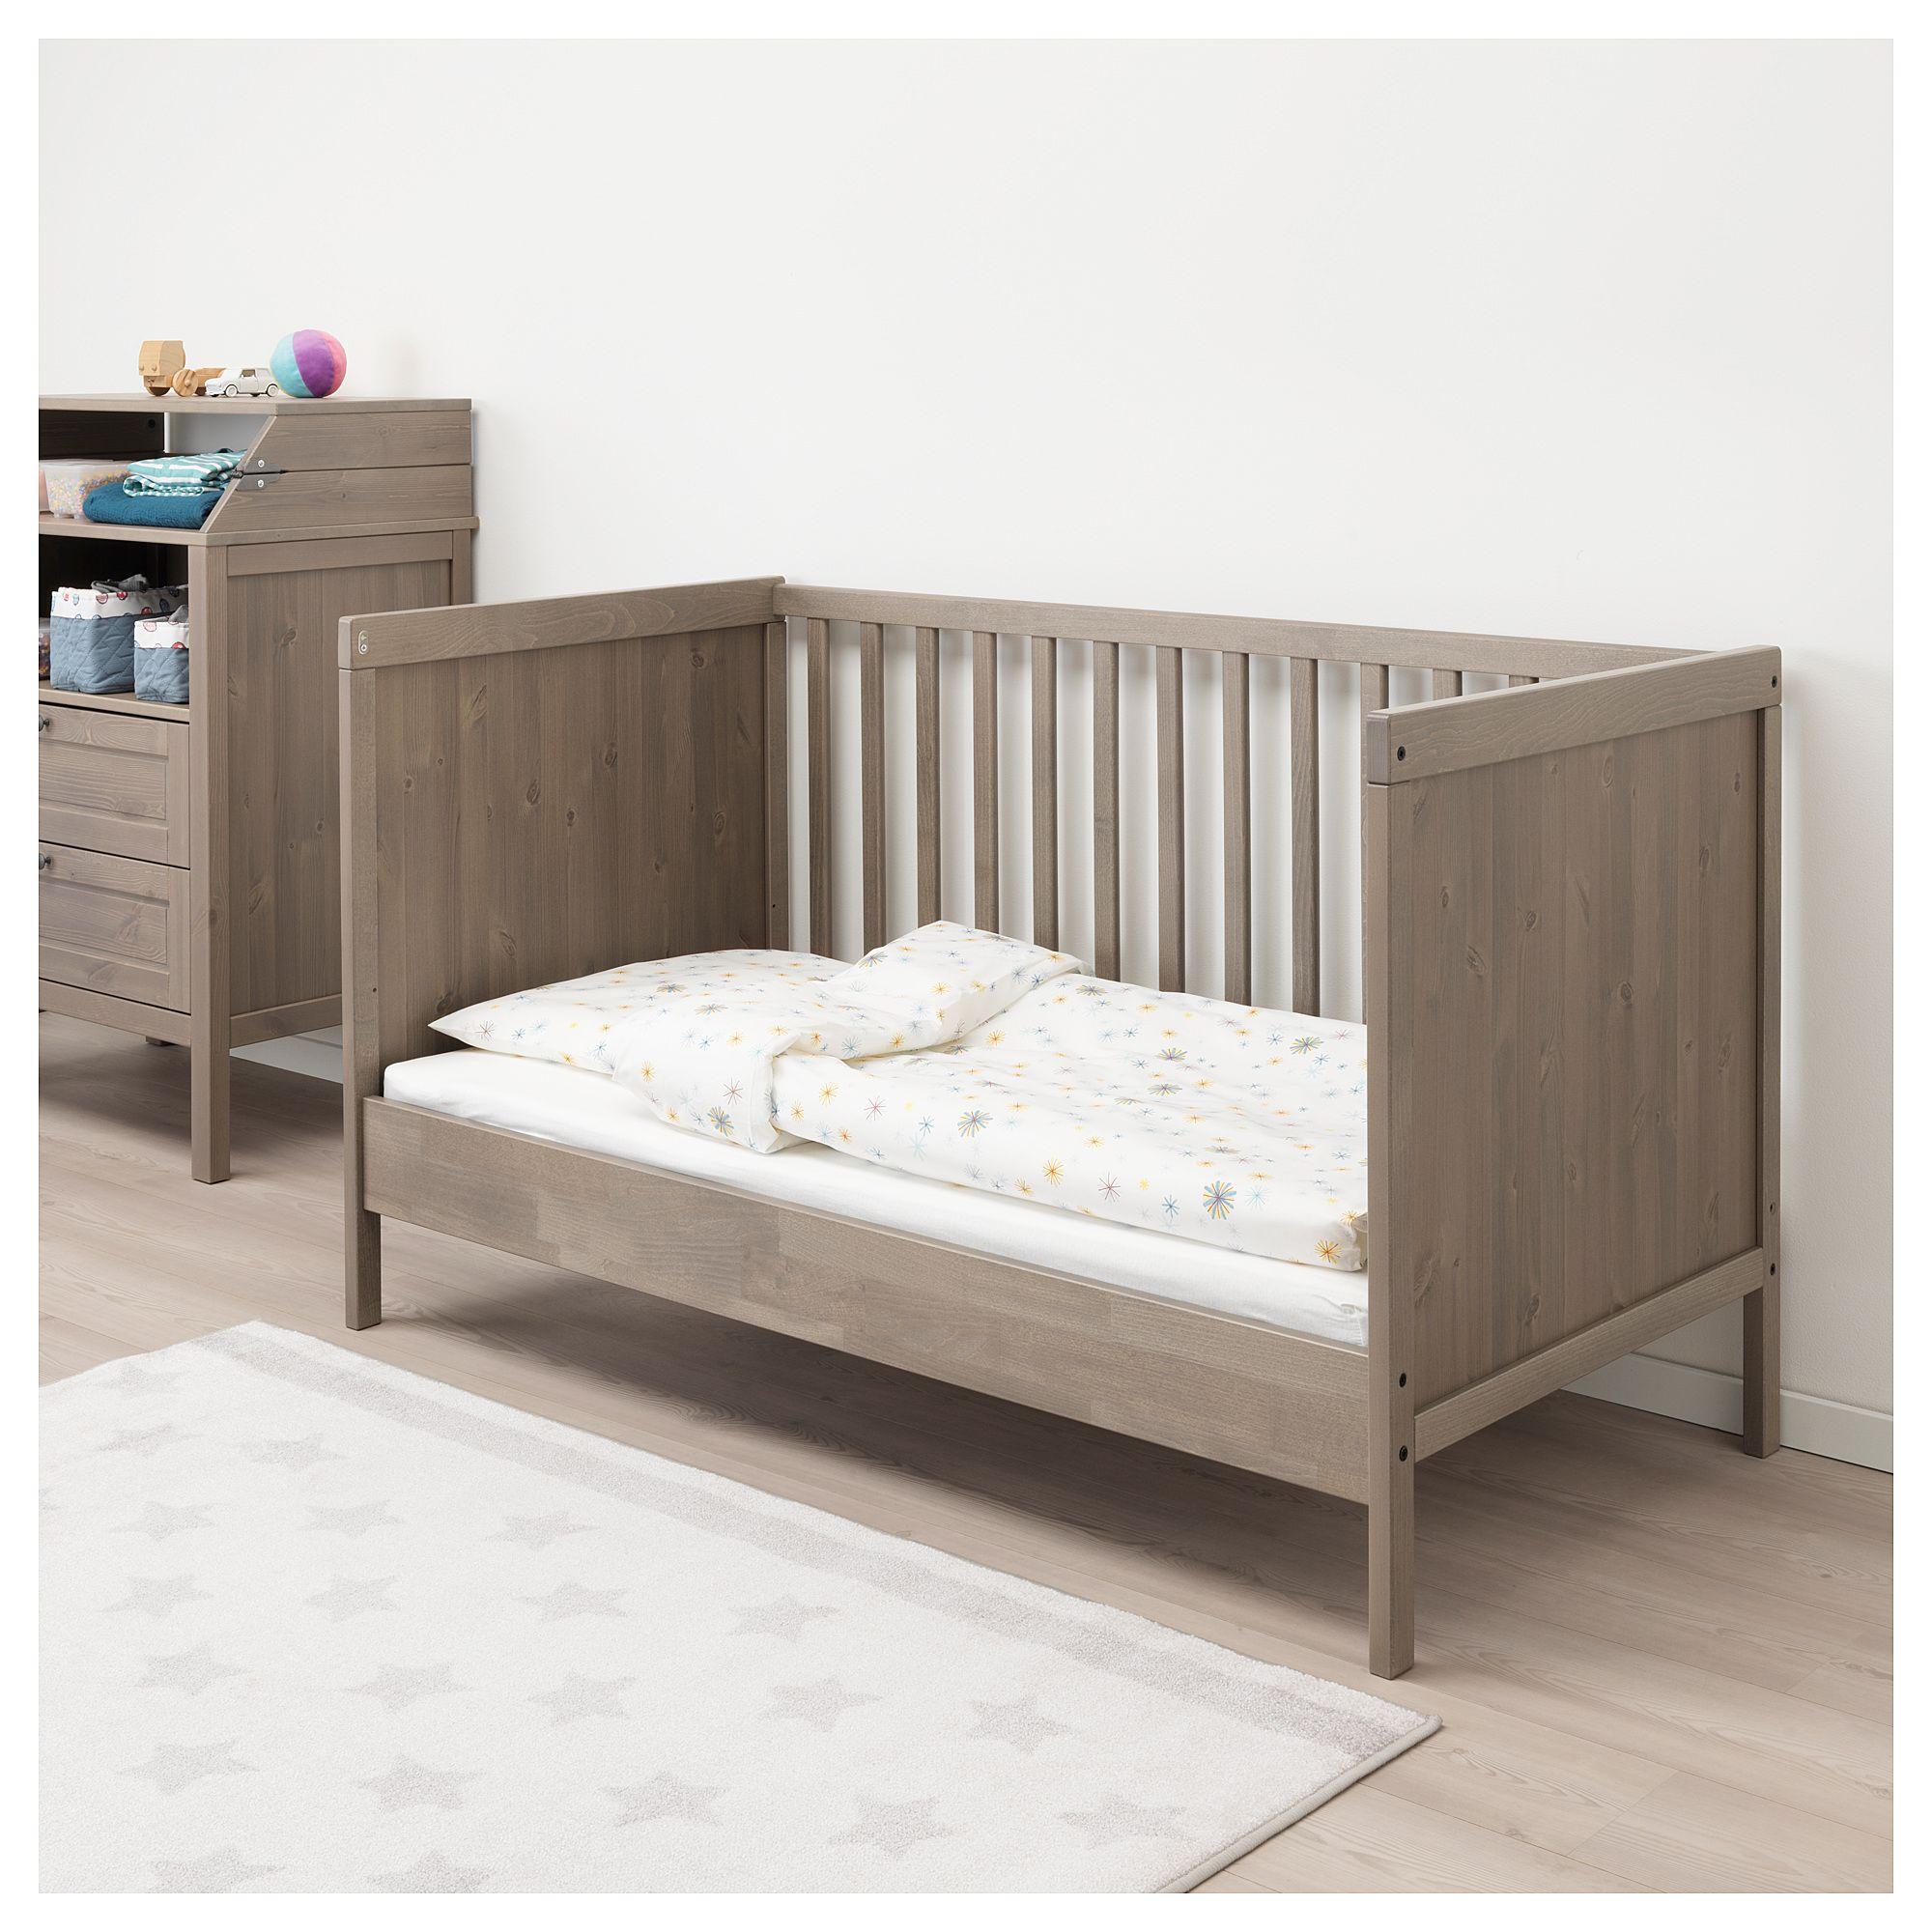 SUNDVIK κούνια IKEA in 2020 Cot, Ikea baby, Ikea